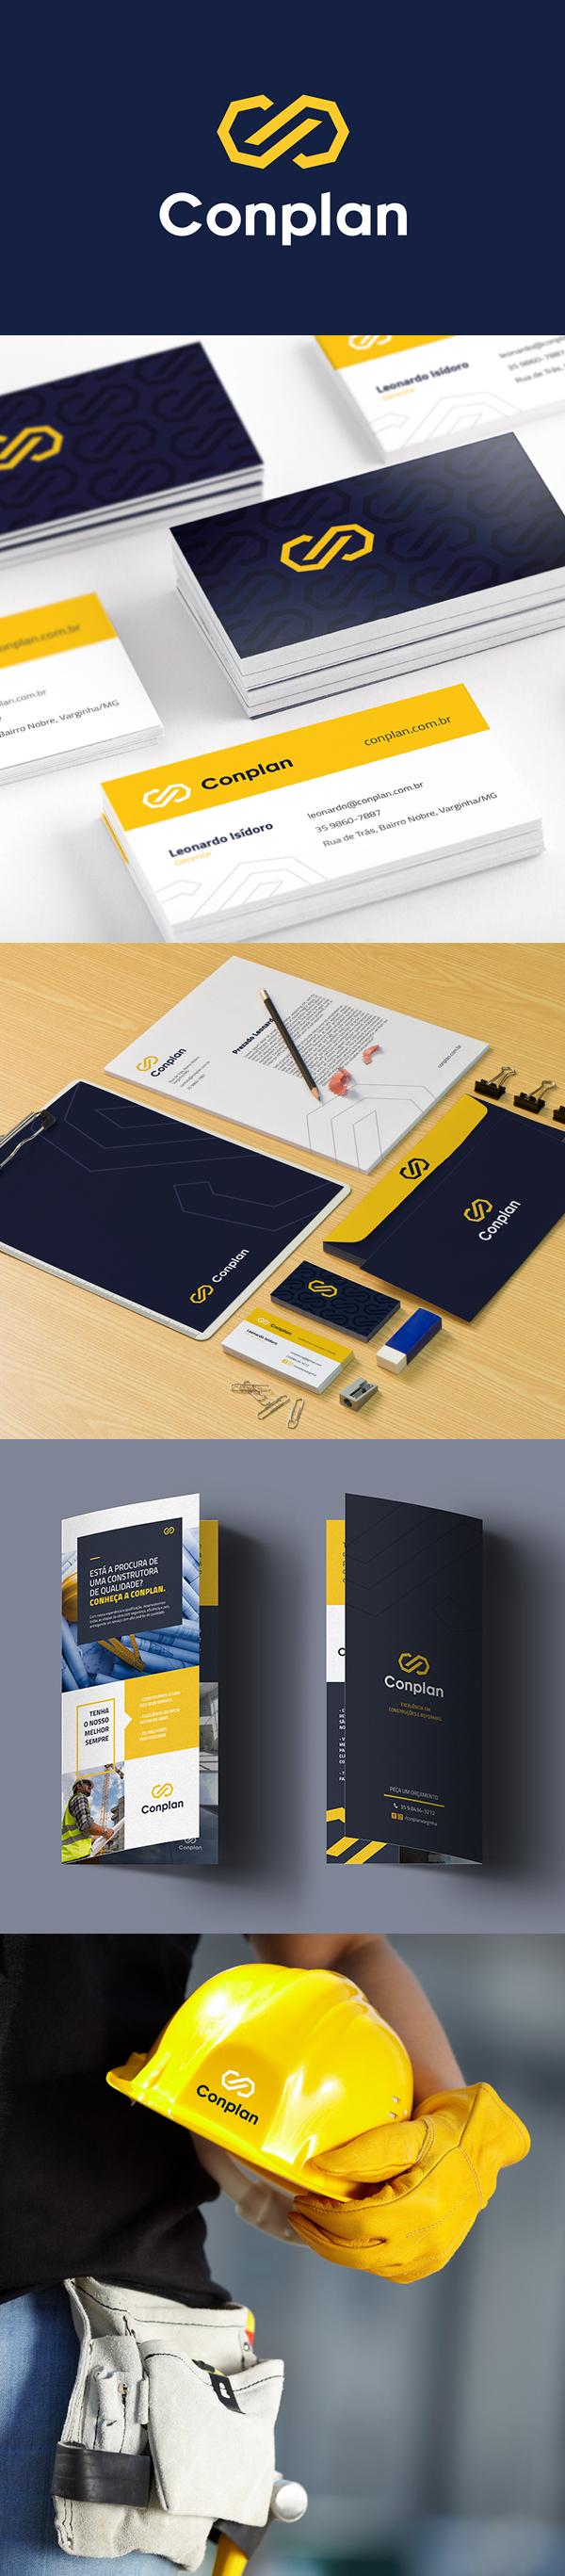 Branding: Conplan Branding by Otávio Mendes